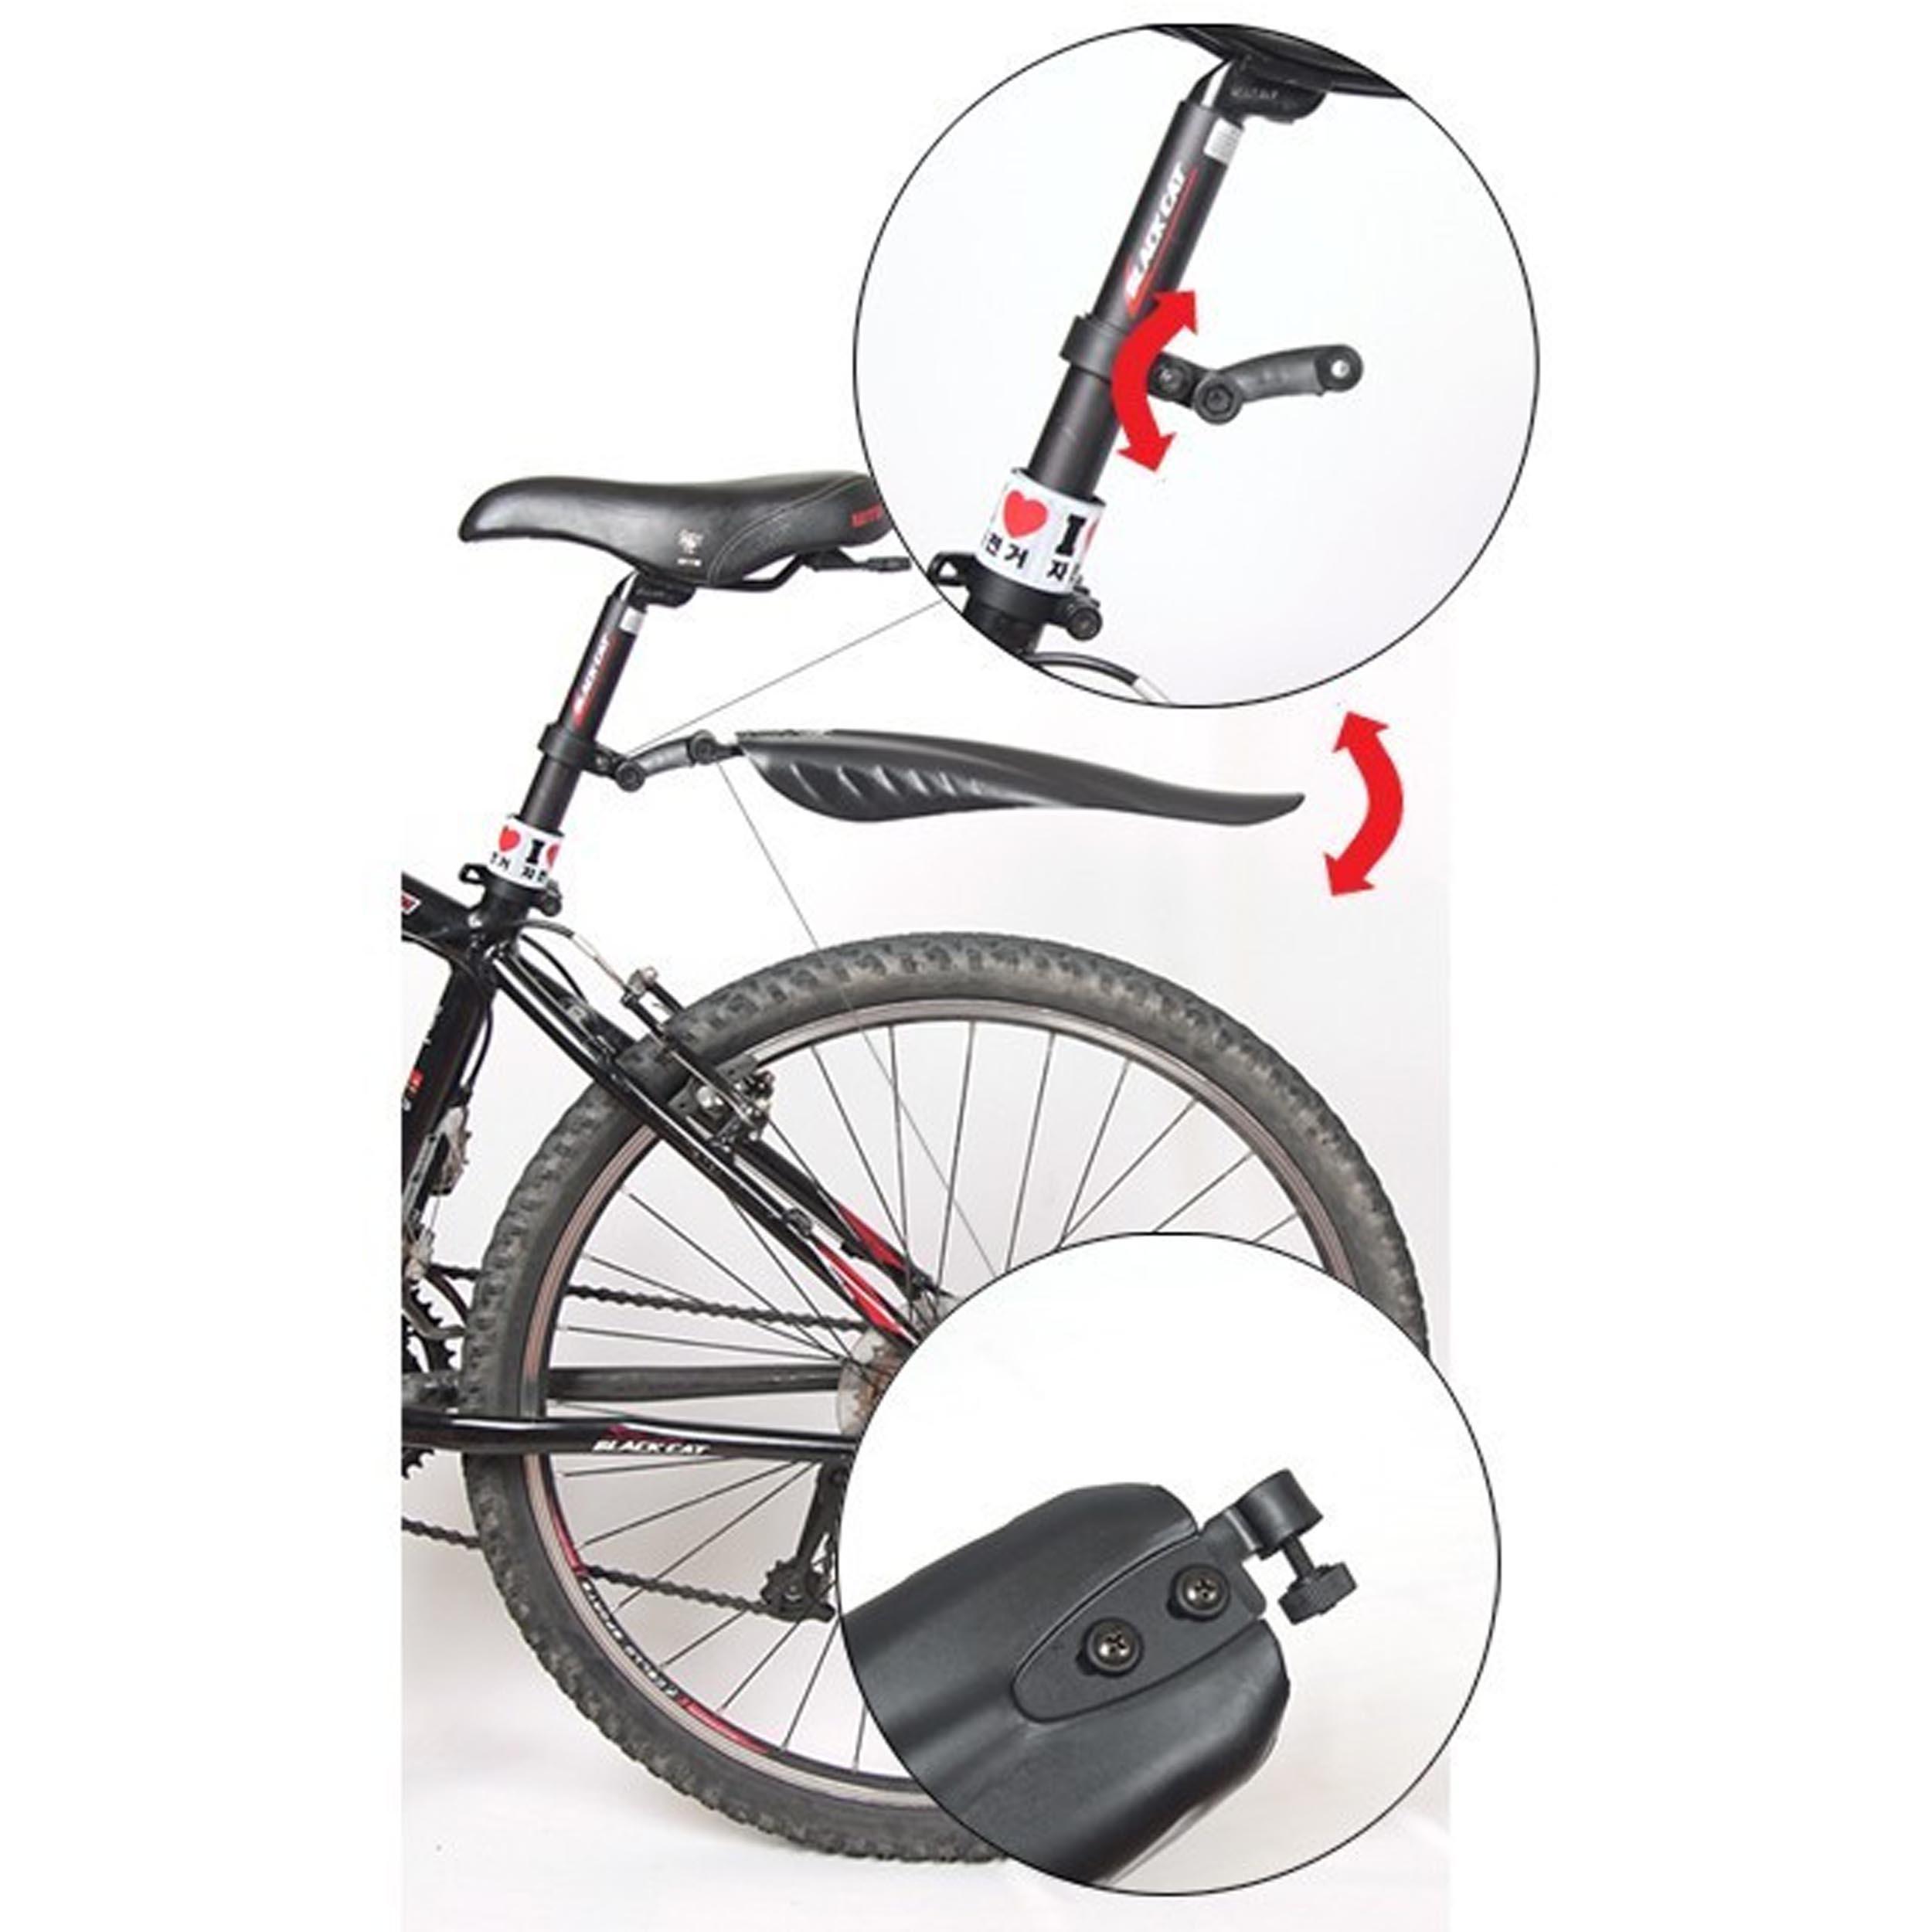 Bike MudGuide for Rear Wheel & Front Wheel (Detachable Bicycle Tire Fender Set)